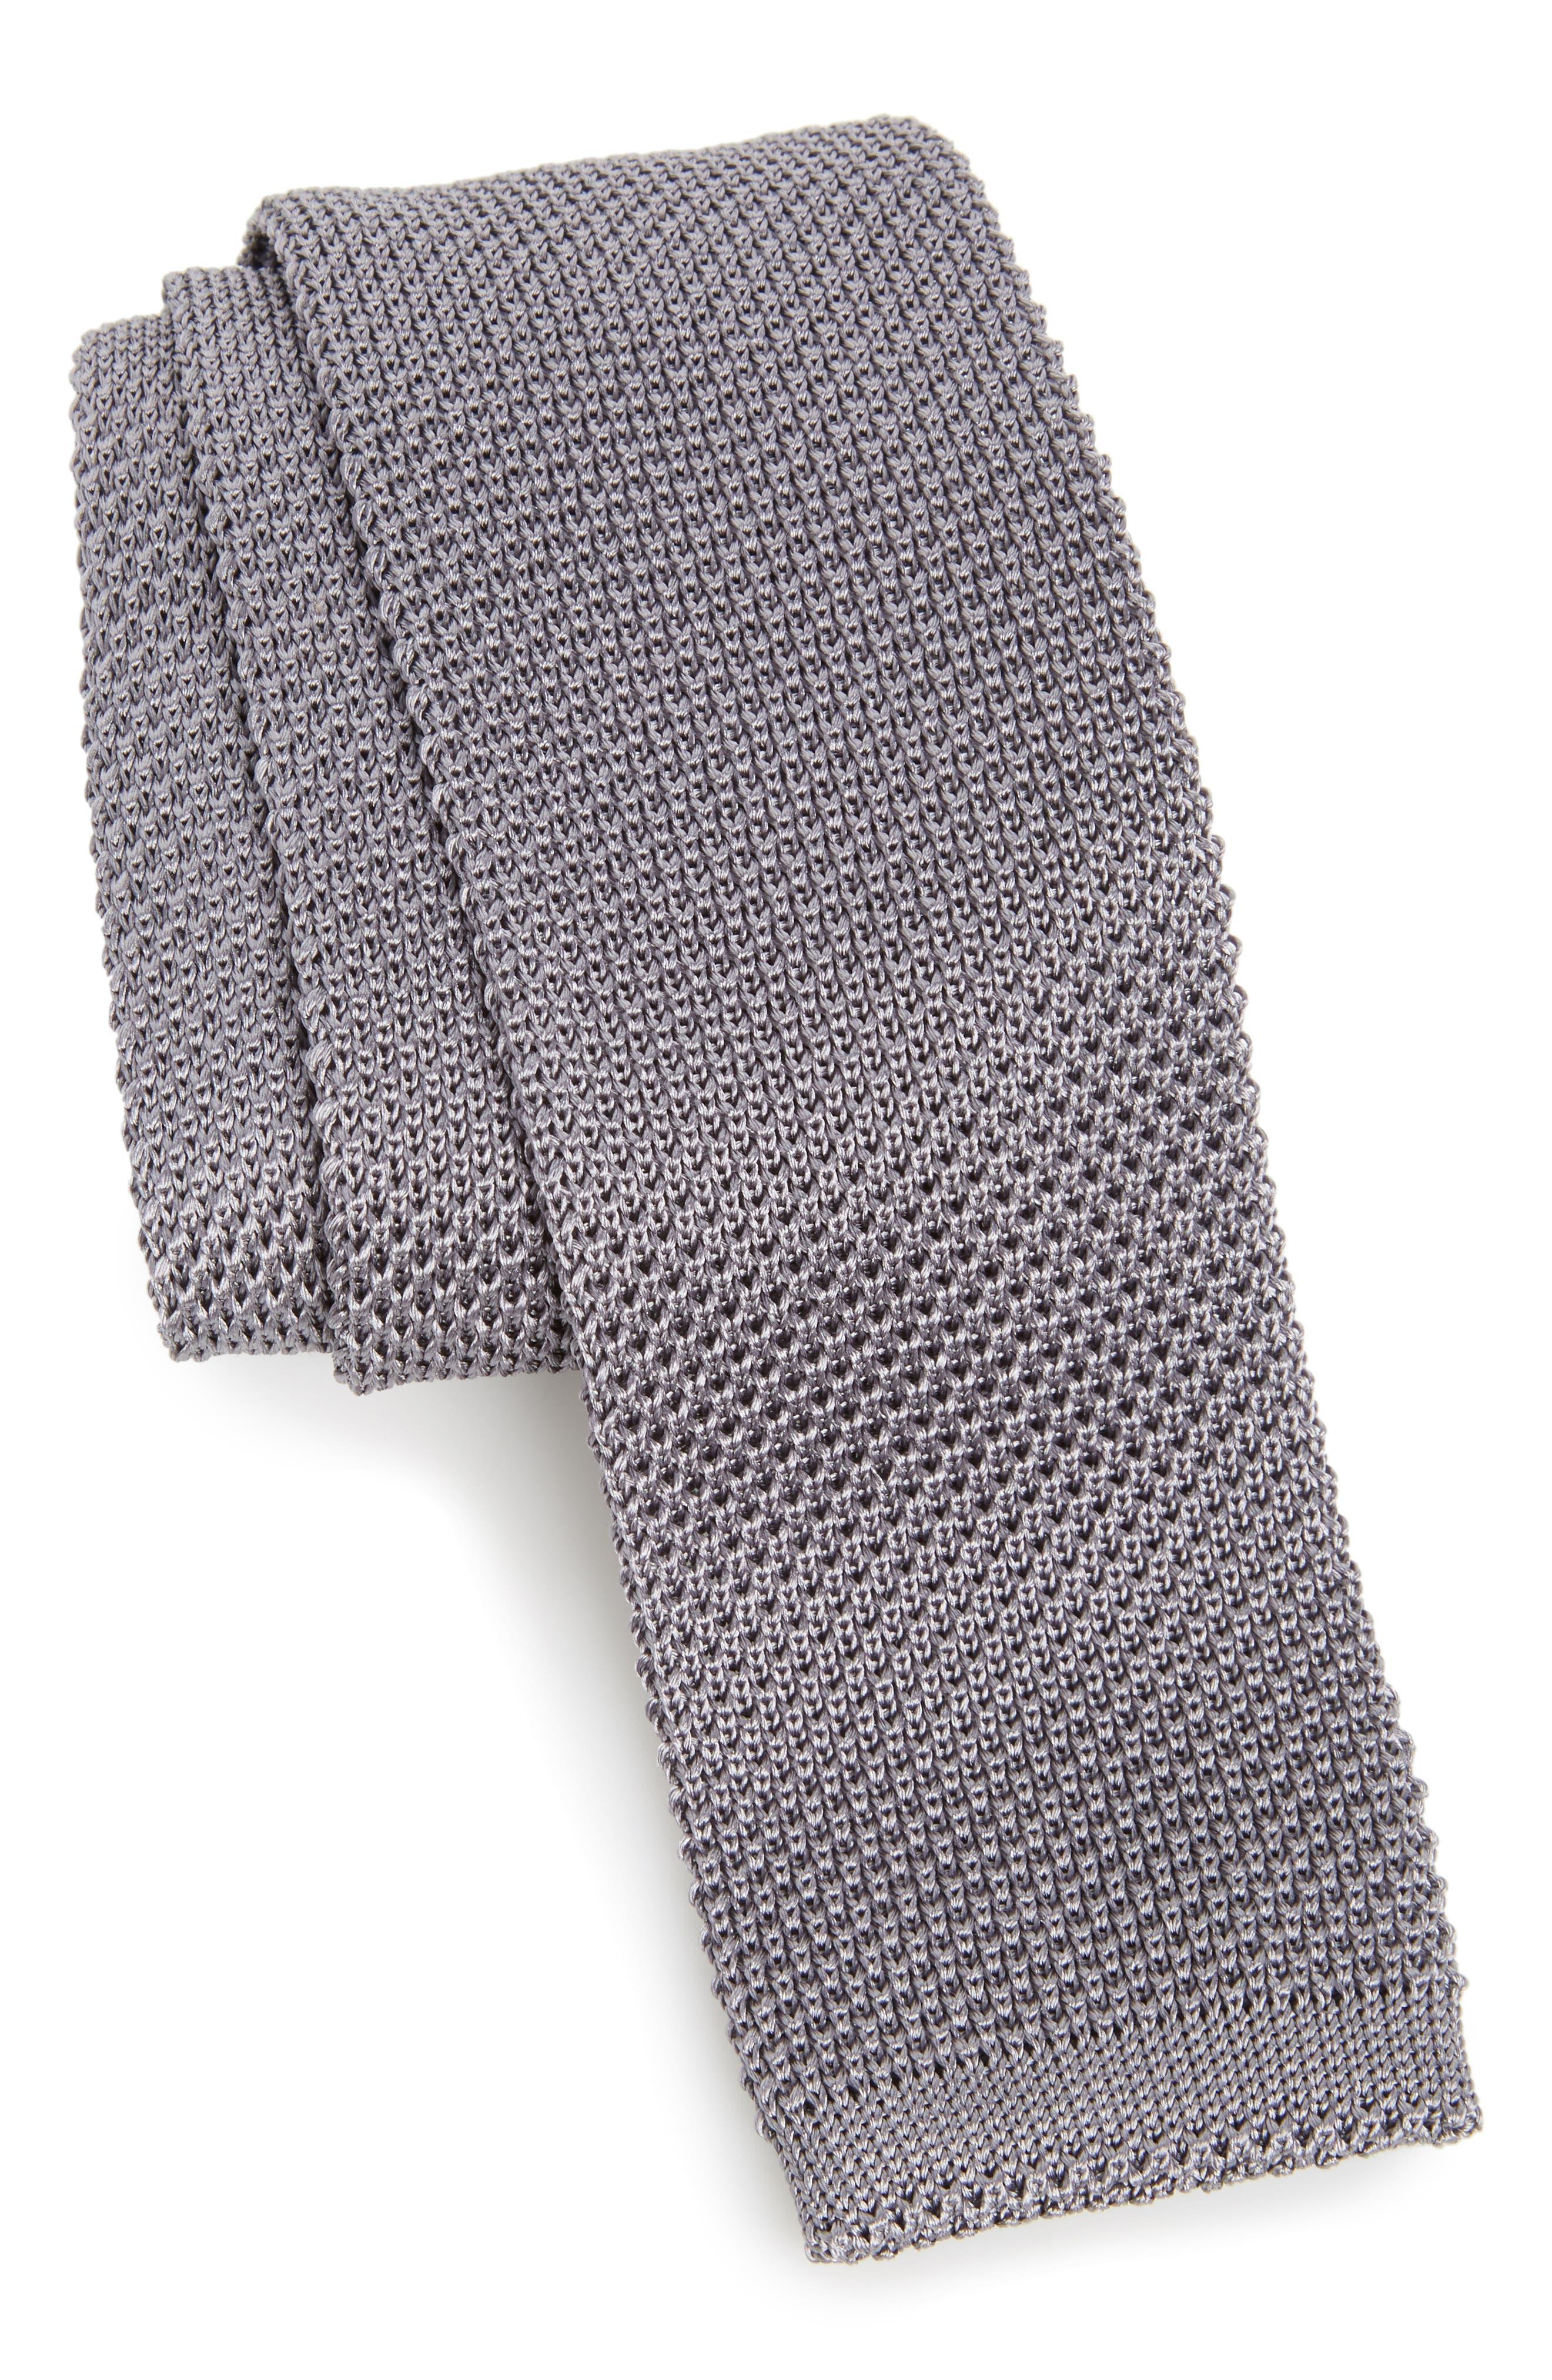 Stuart Silk Knit Tie,                             Main thumbnail 1, color,                             GREY